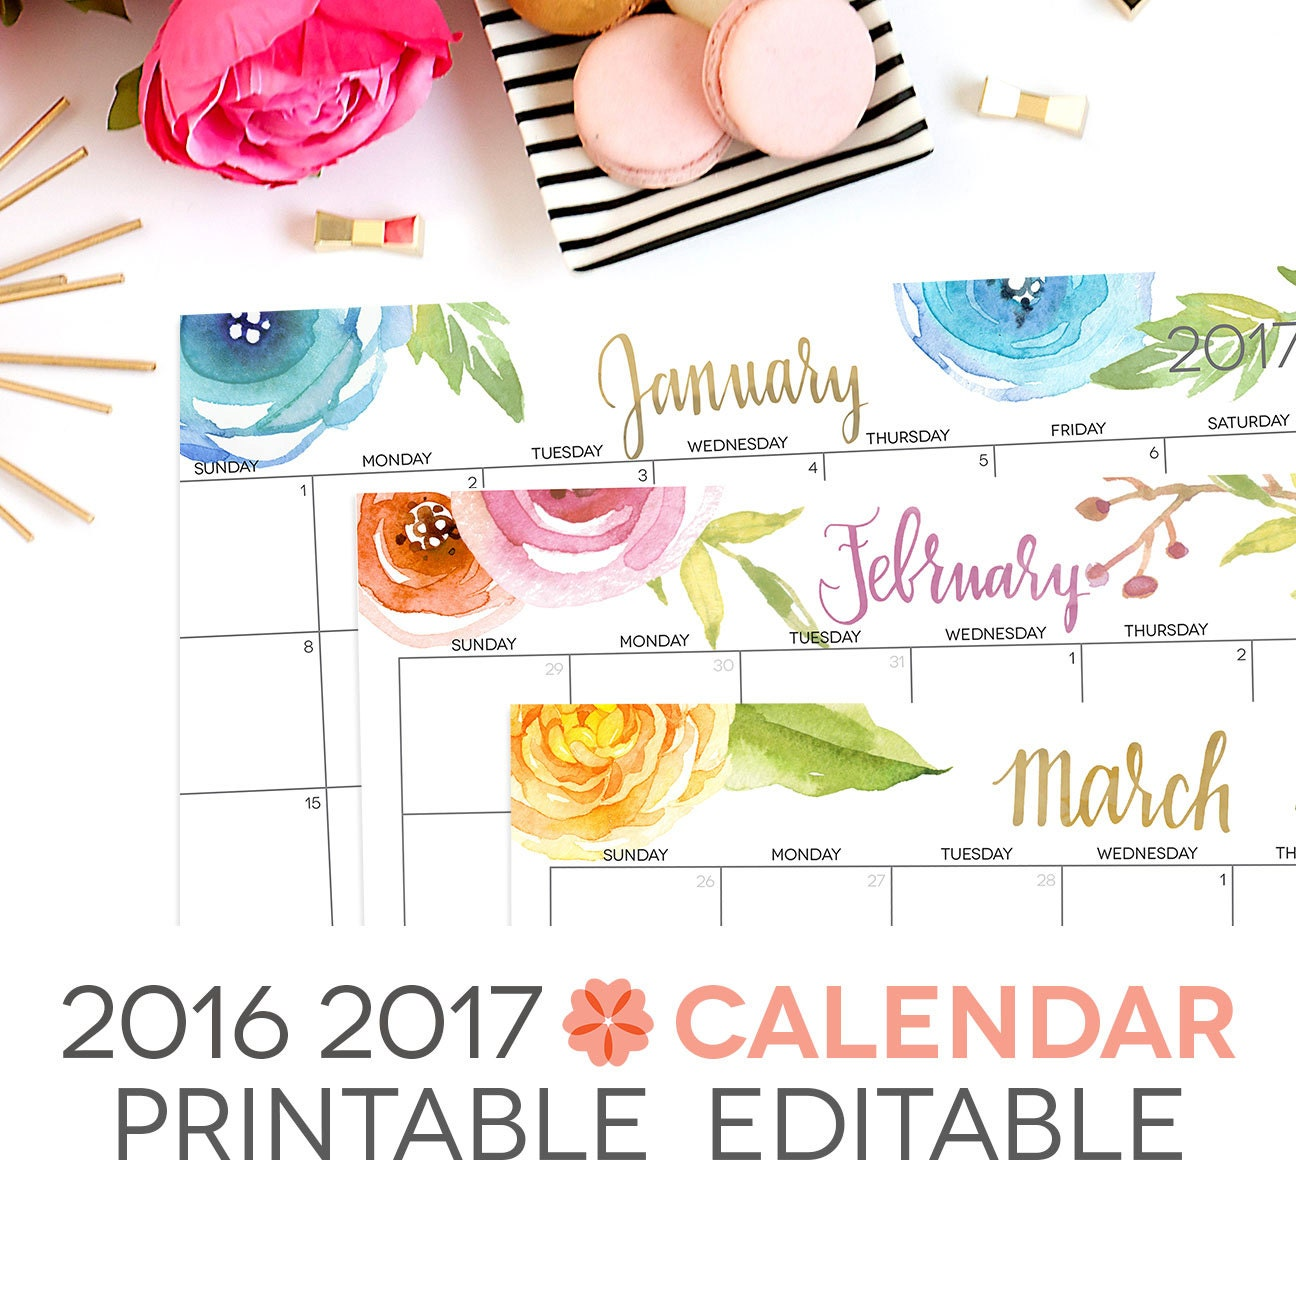 2017 Calendar Printable Editable Digital by PerennialPlanner